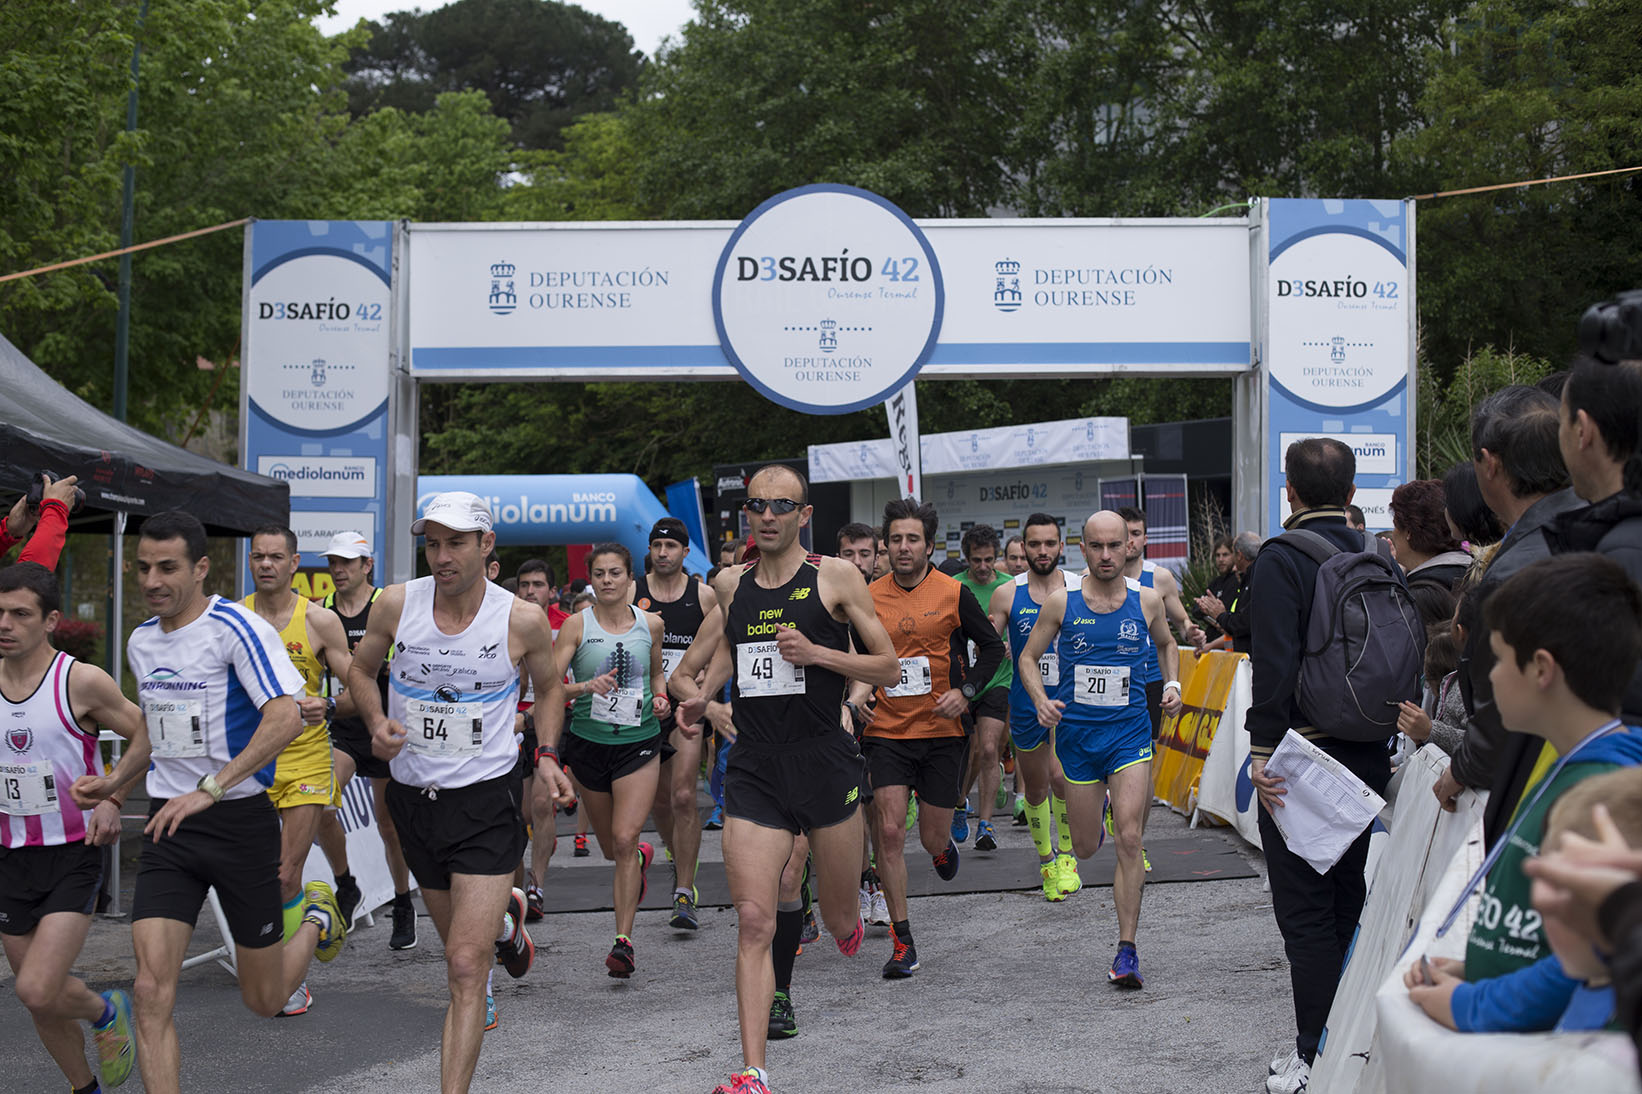 Nace el circuito 15 km Series Banco Medionalum